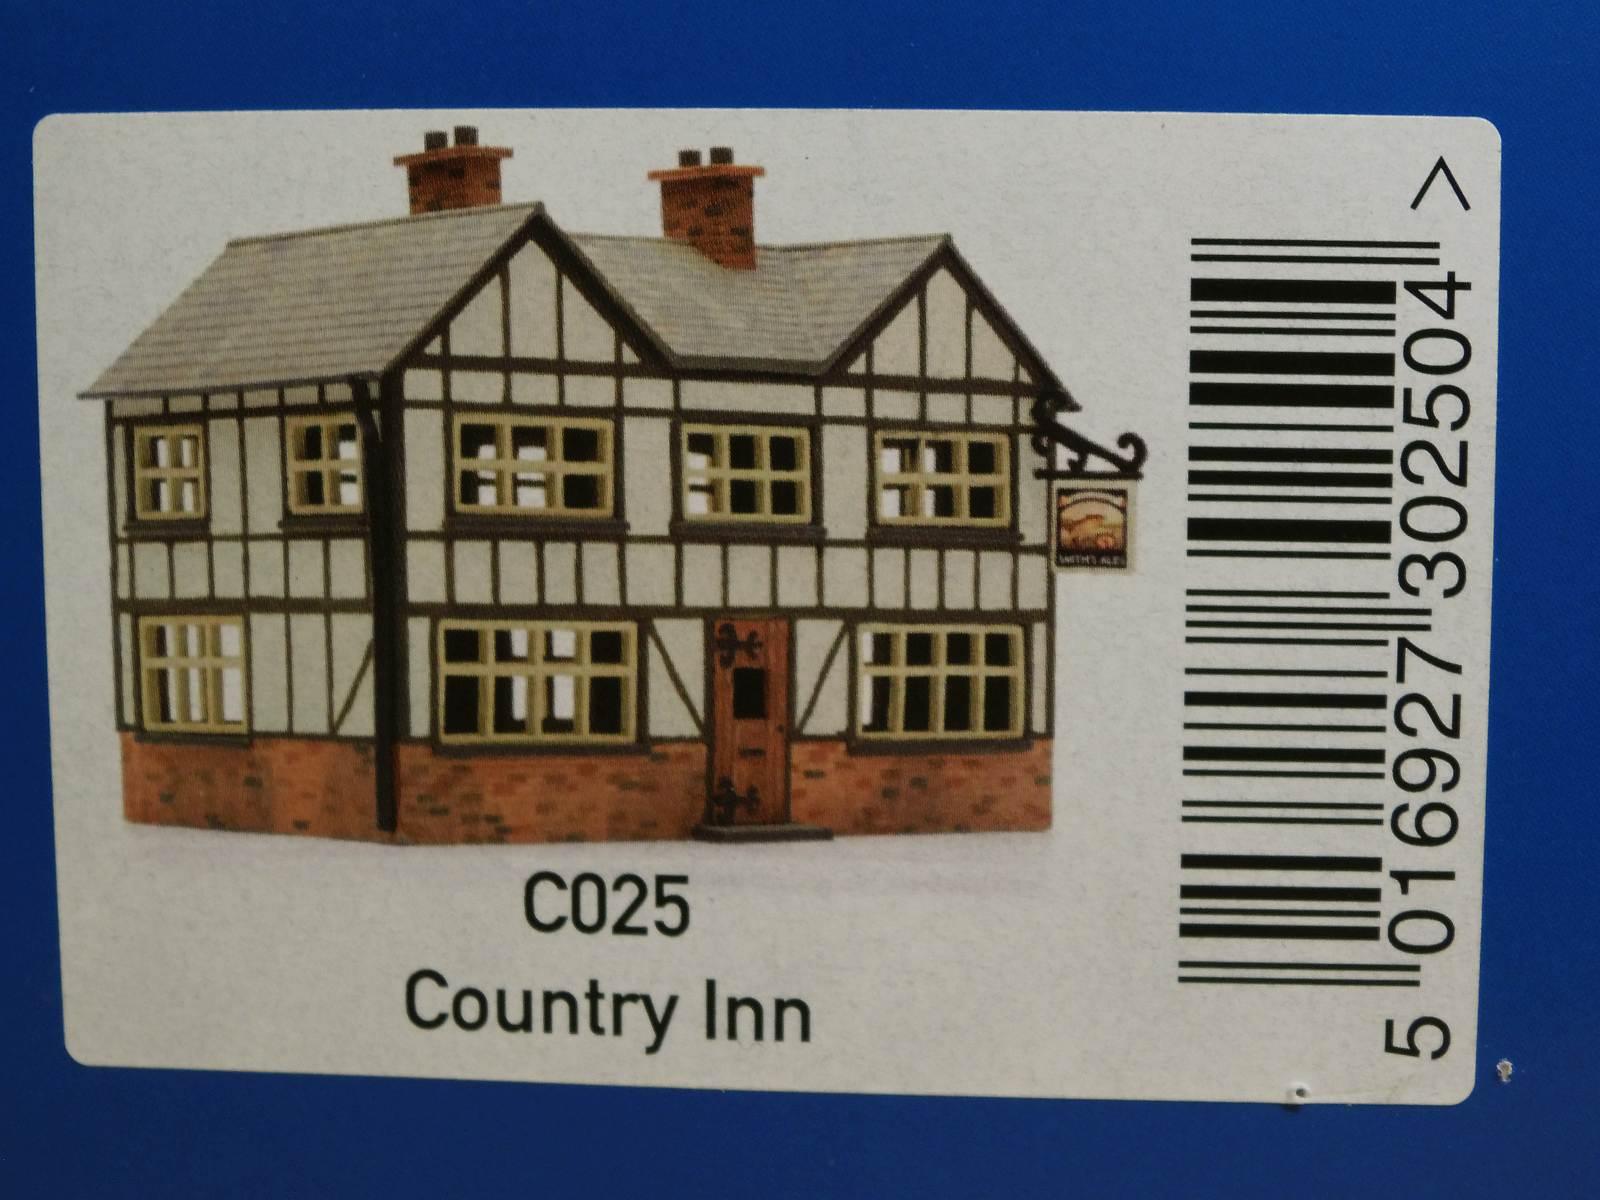 DAPOL – C025 Country Inn